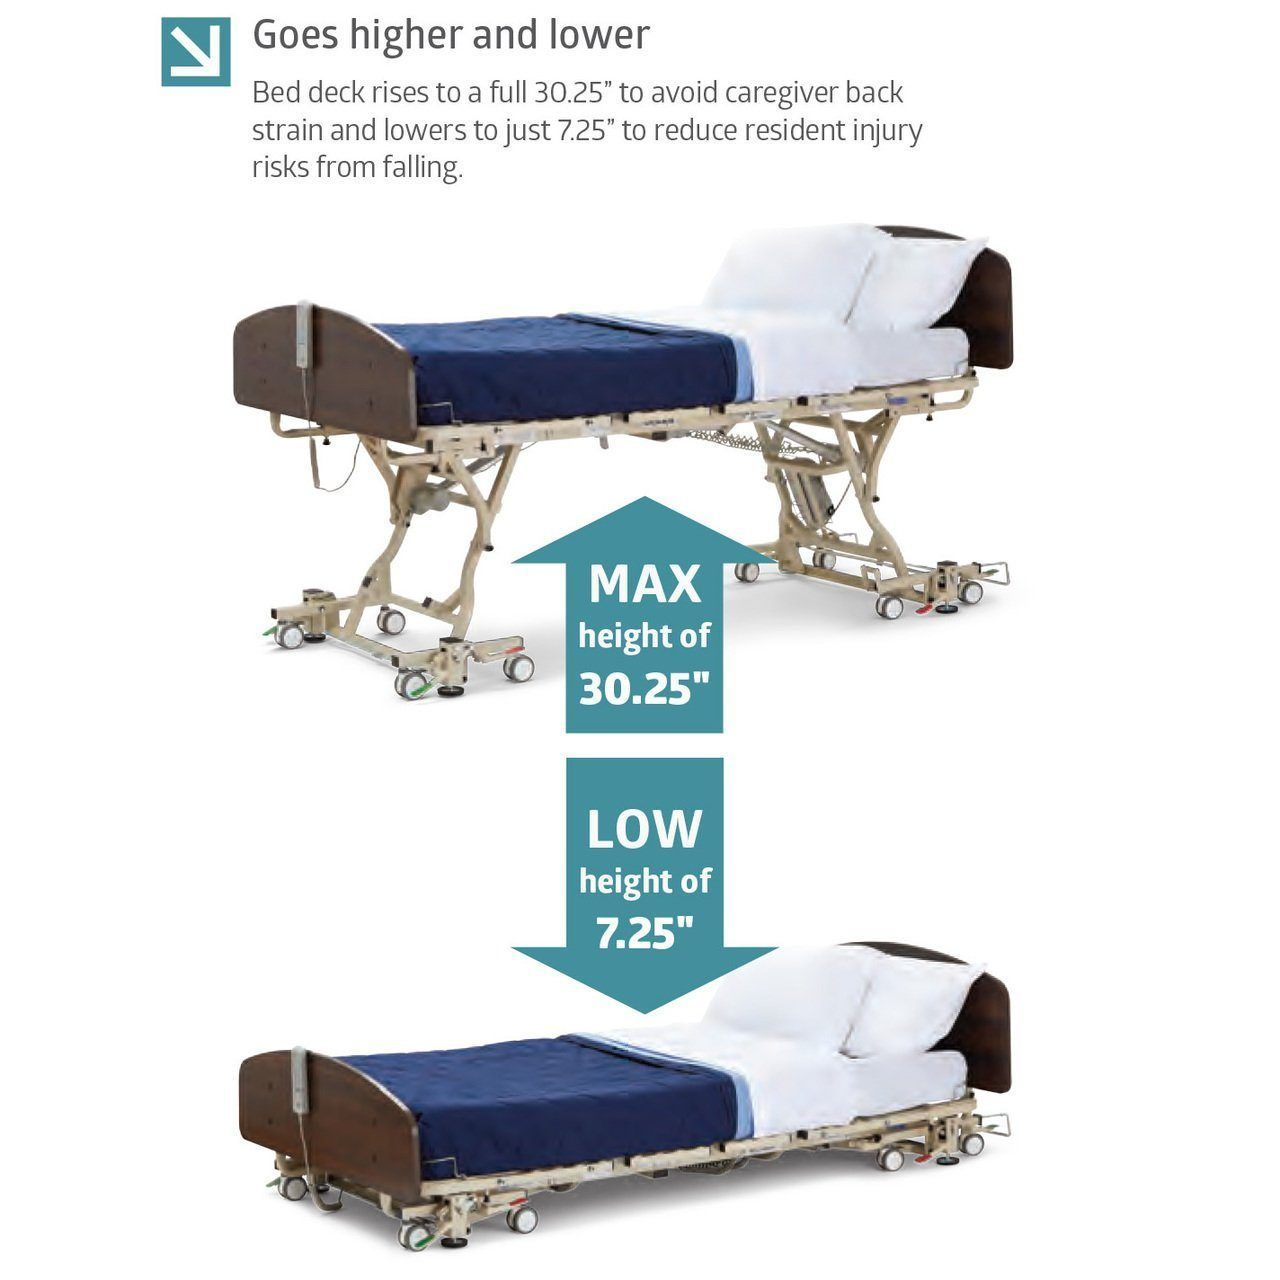 Medline Alterra MAXX Hospital Bed Set Bedding sets, Bed